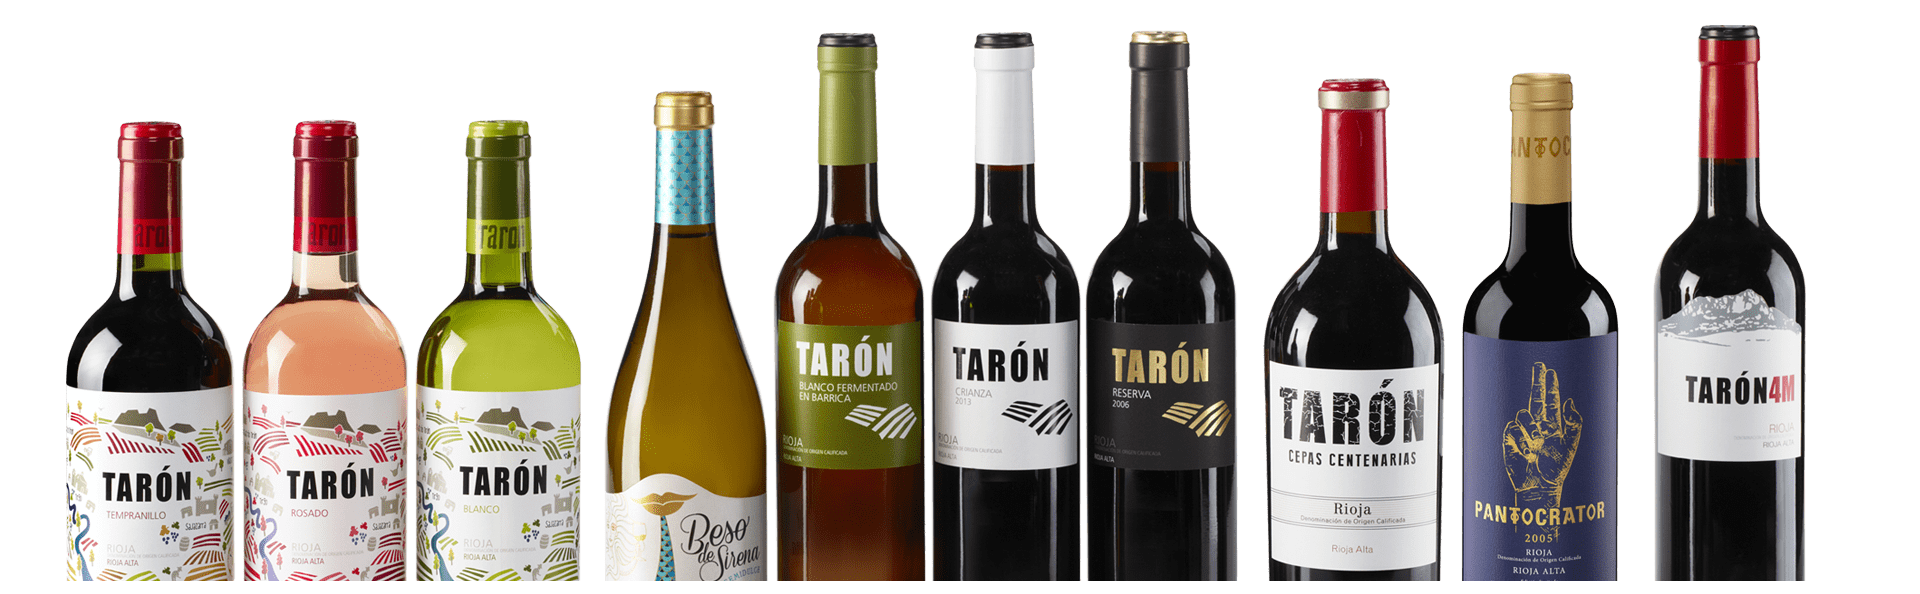 bodegas-taron-vinos-bodegon-completo 02